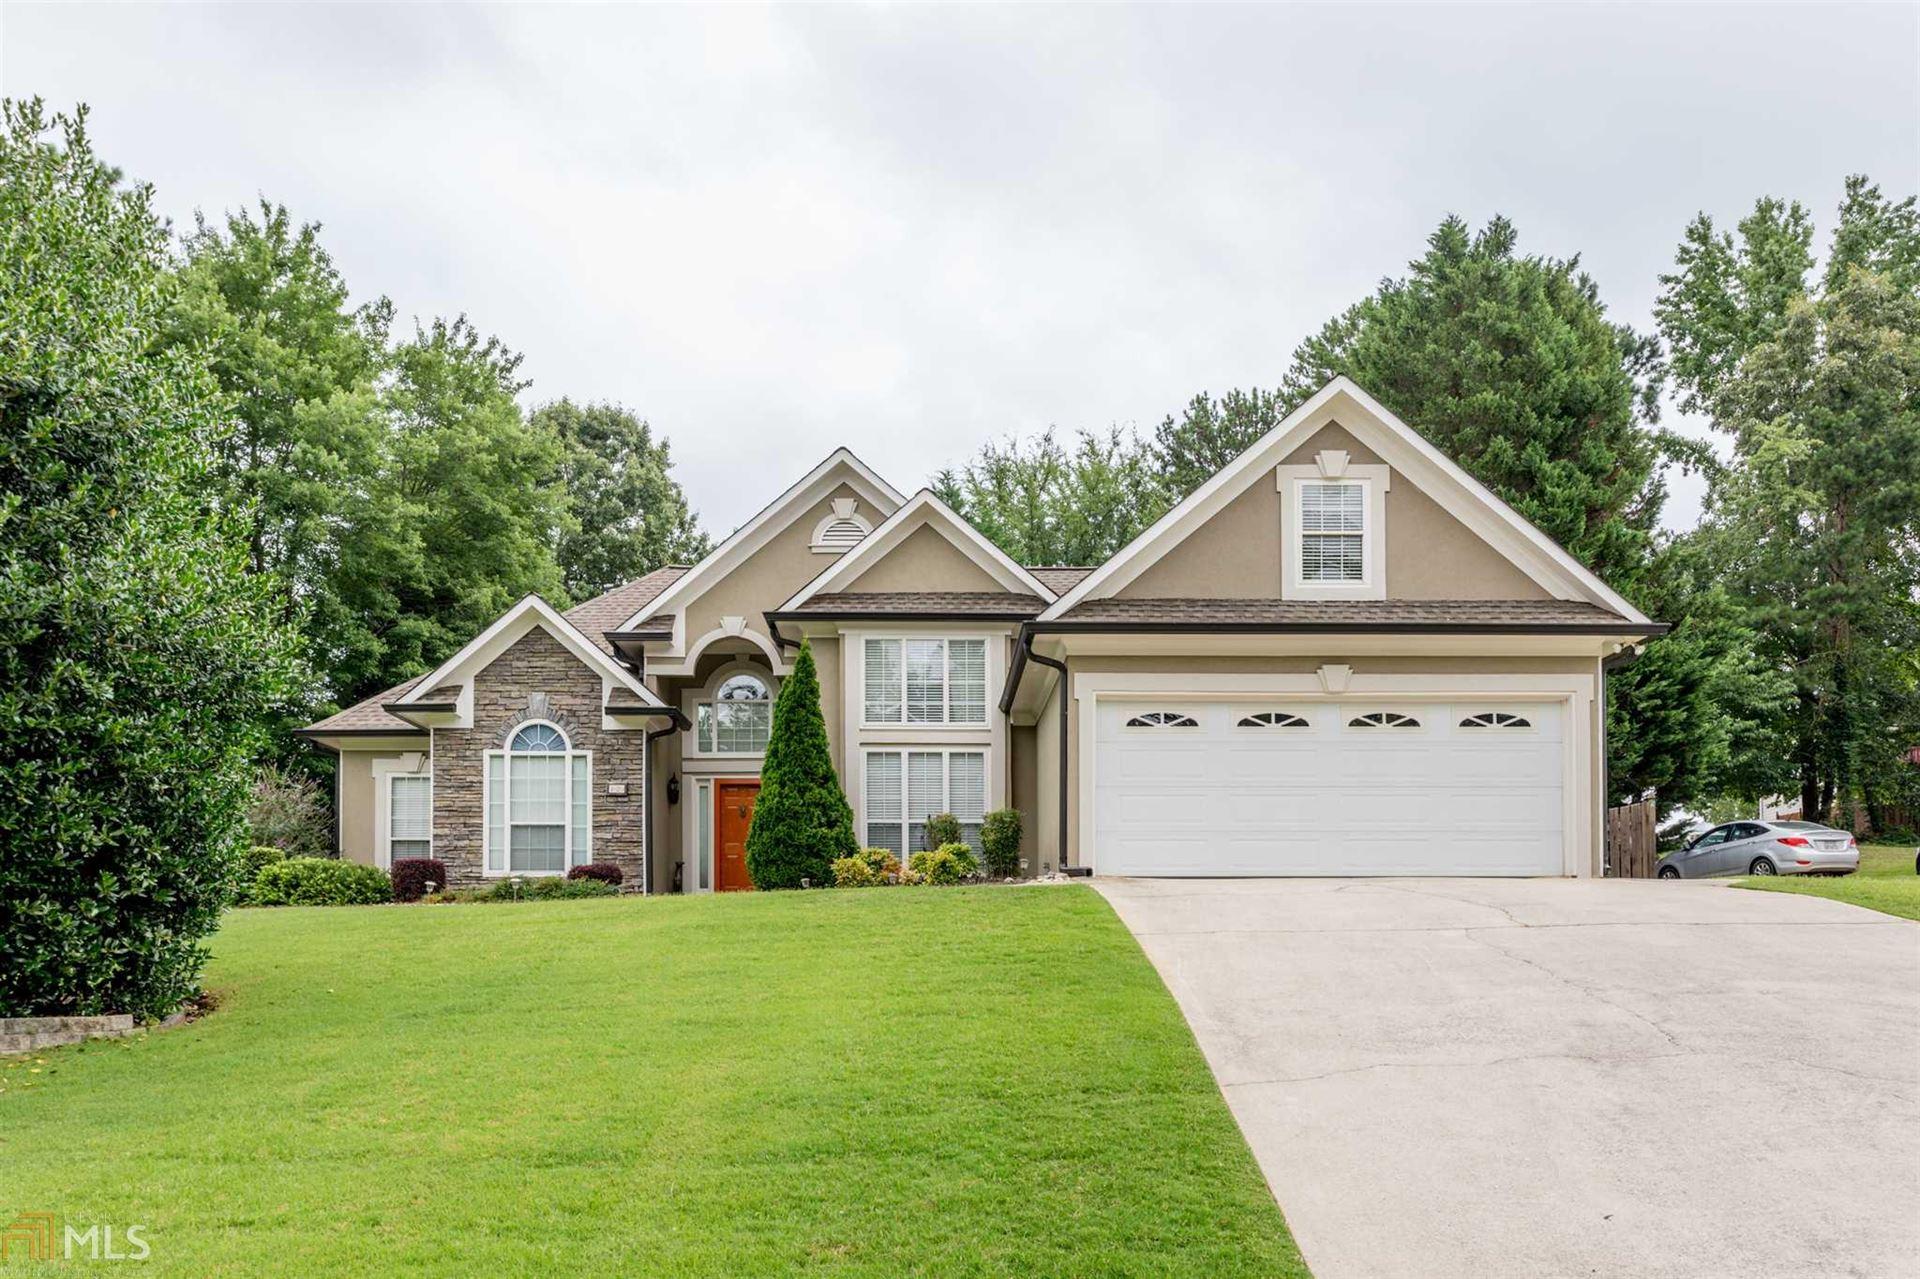 1020 Regency, Acworth, GA 30102 - MLS#: 8846171